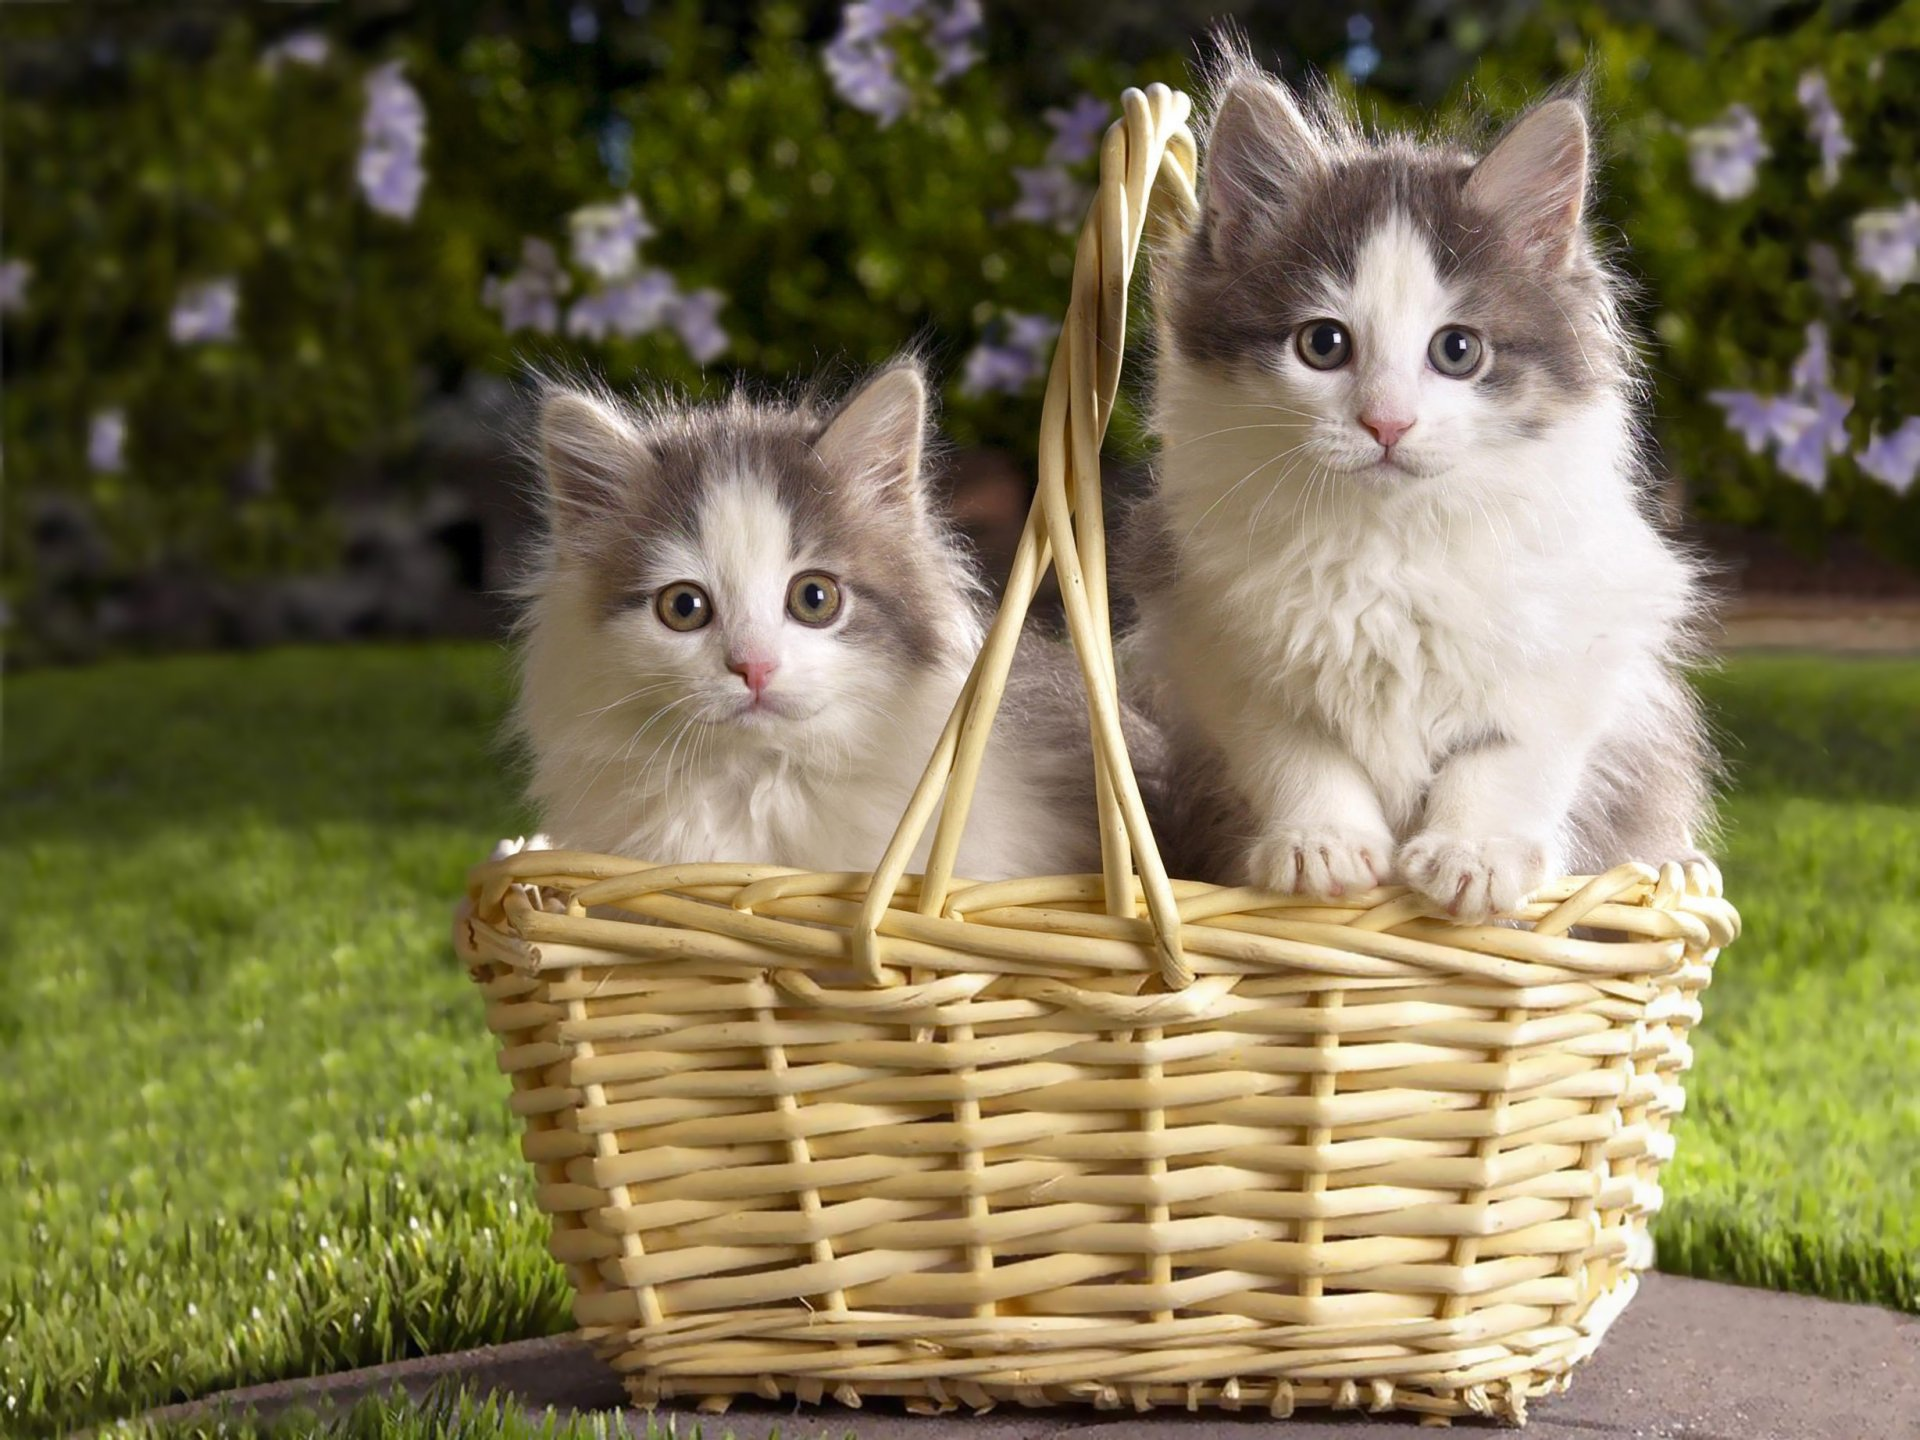 Картинки два котенка в корзинке